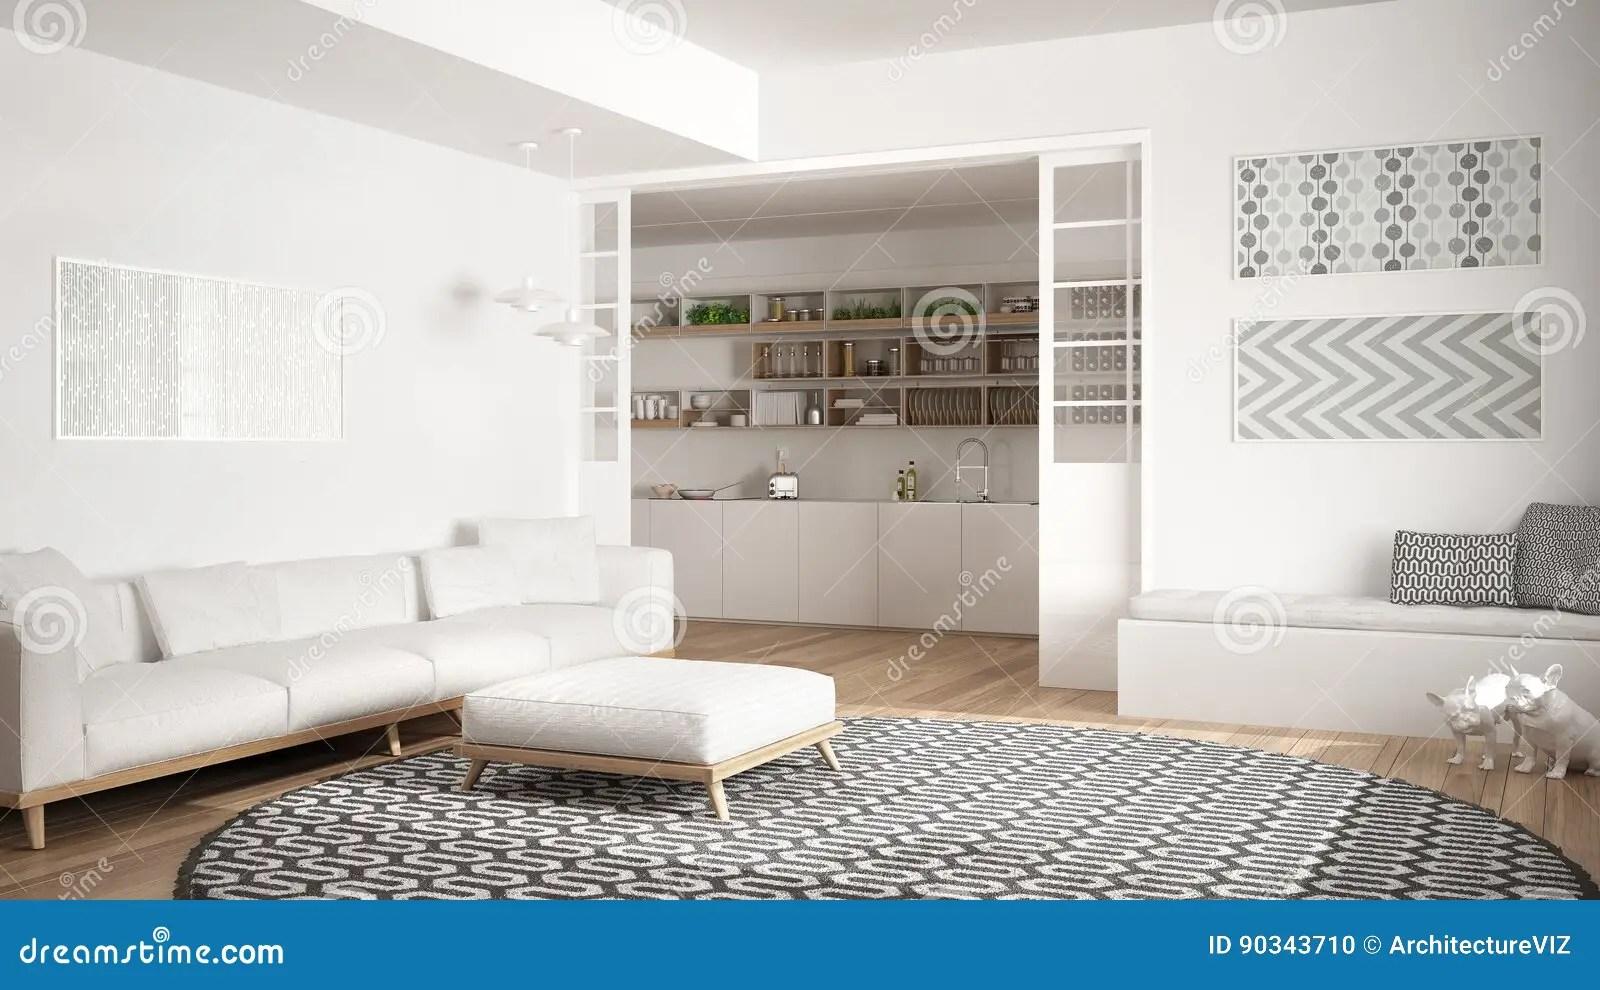 wine kitchen rugs island with fridge 有沙发 大圆的地毯和厨房的最低纲领派客厅我库存照片 图片包括有舒适 大圆的地毯和厨房的在背景中 白色现代室内设计最低纲领派客厅